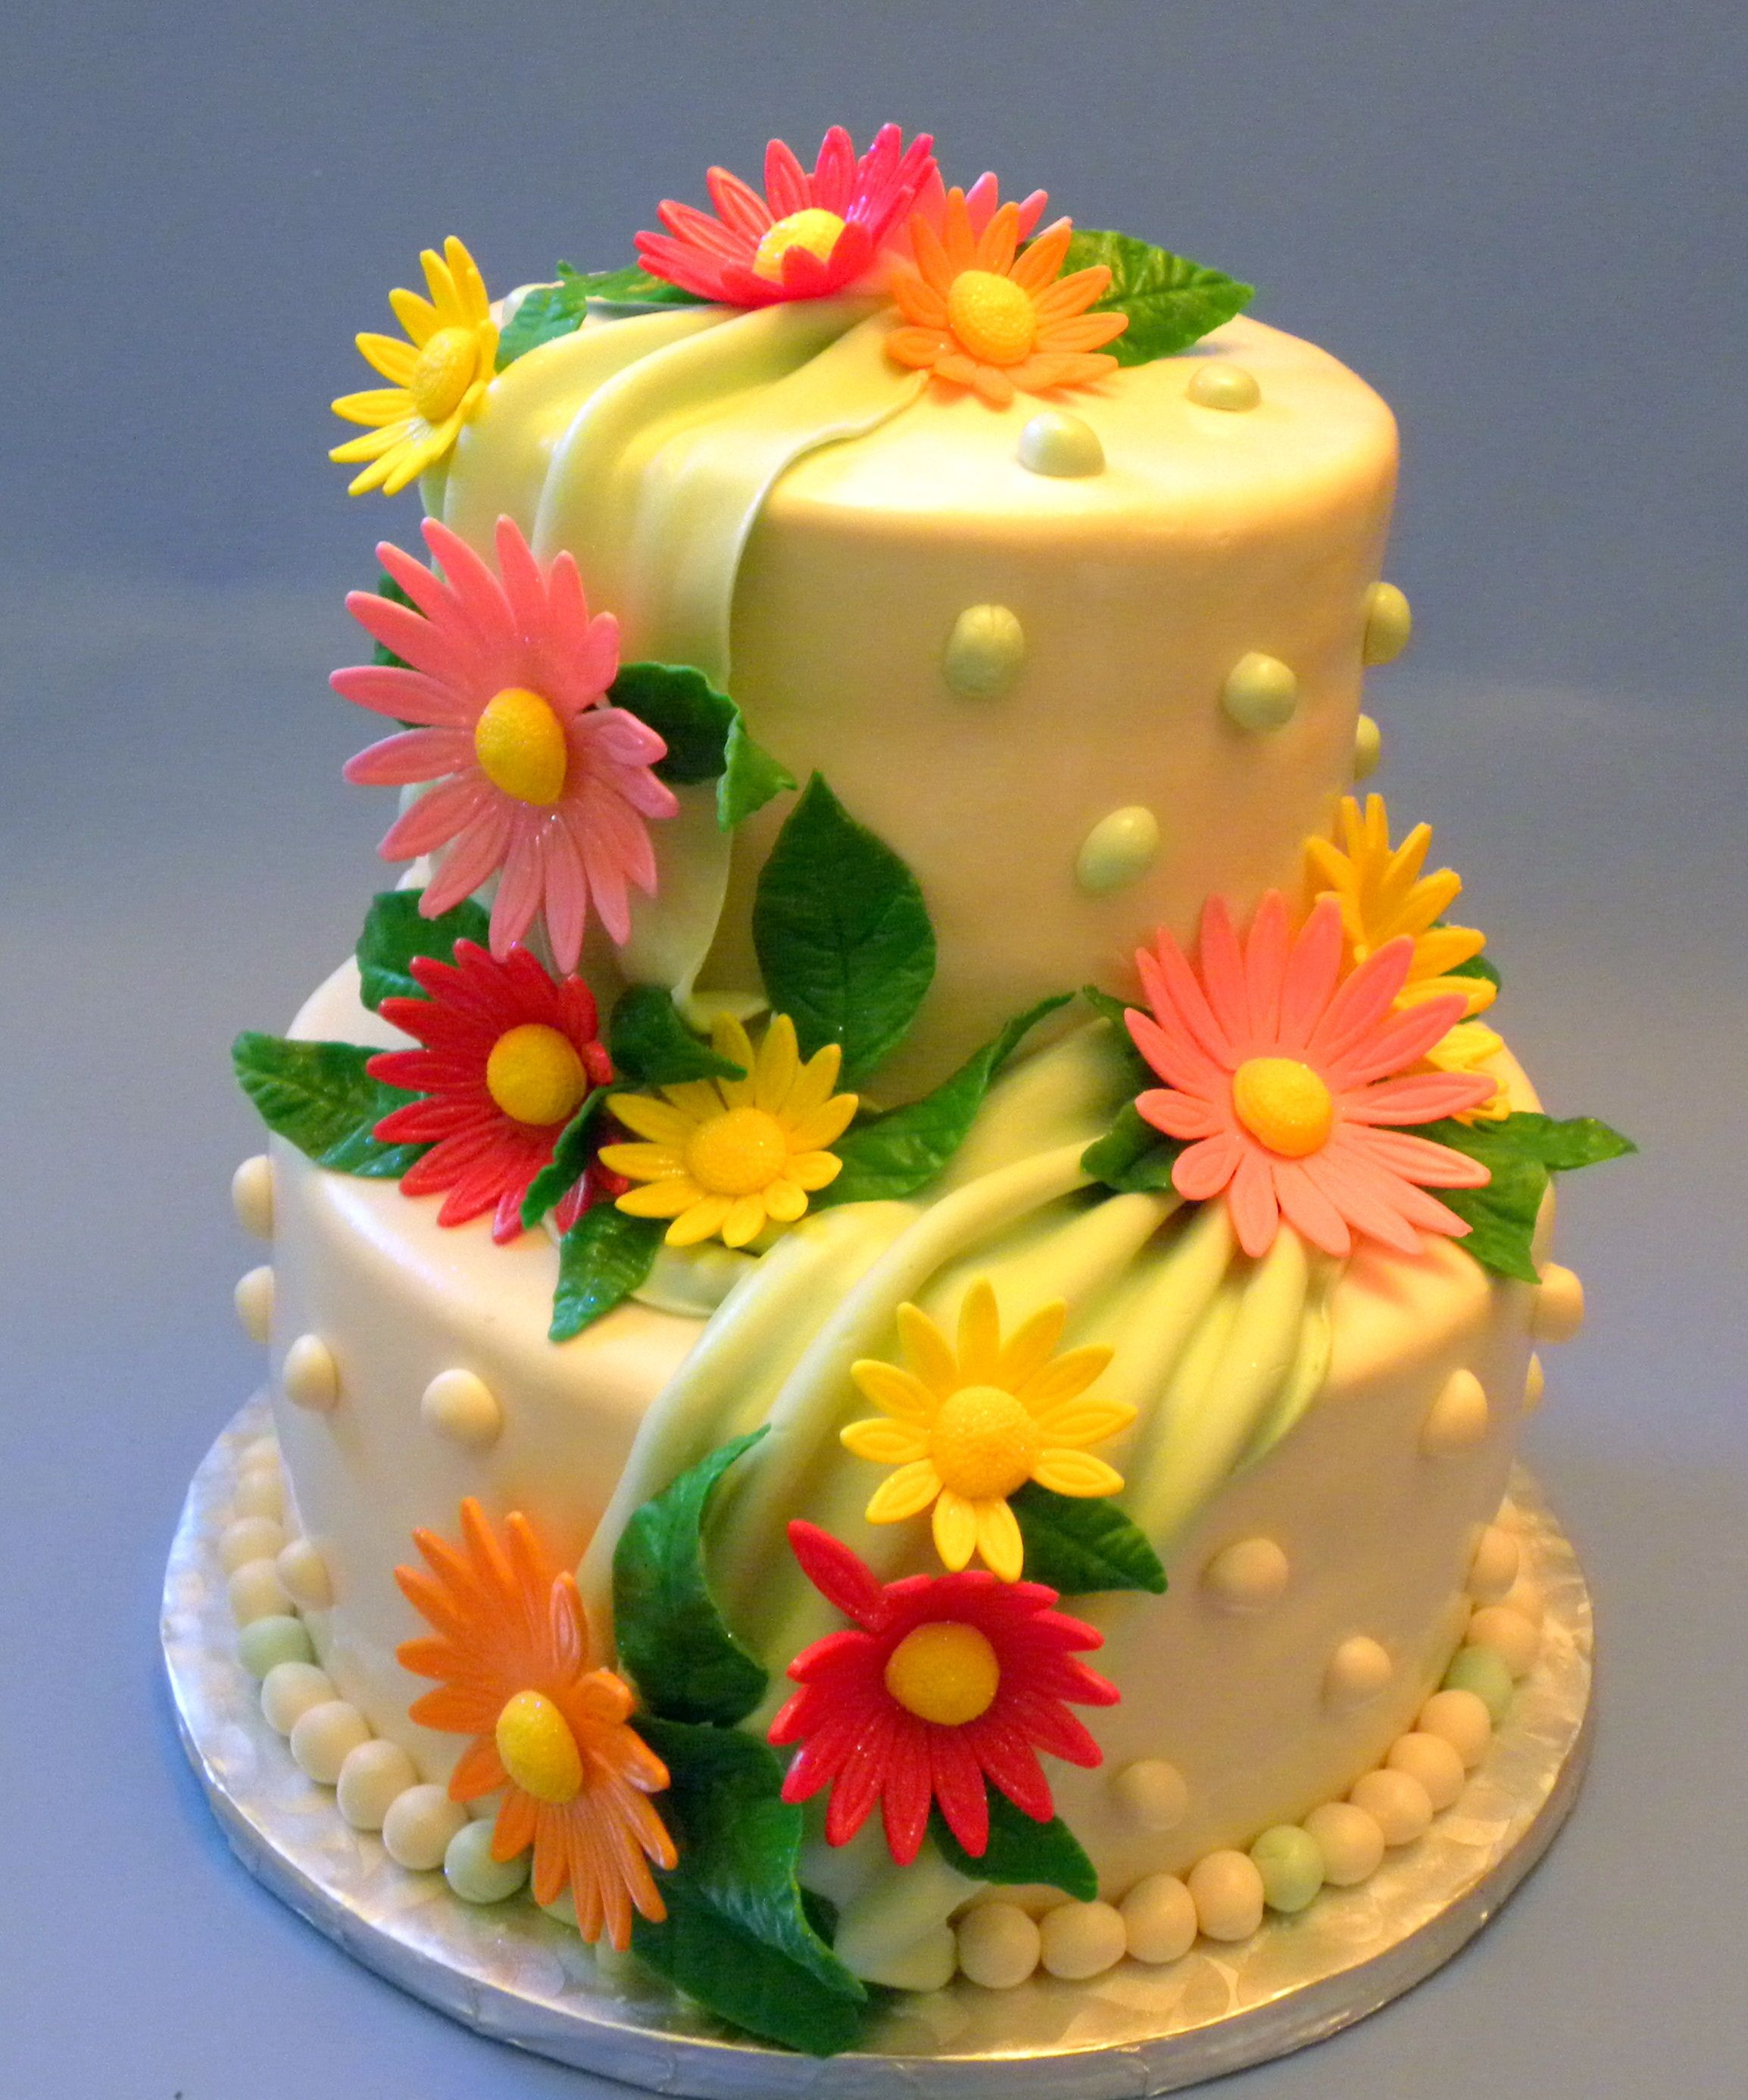 Flower Birthday Cake Best Flower Birthday Cakes Idea Lotsa cakes